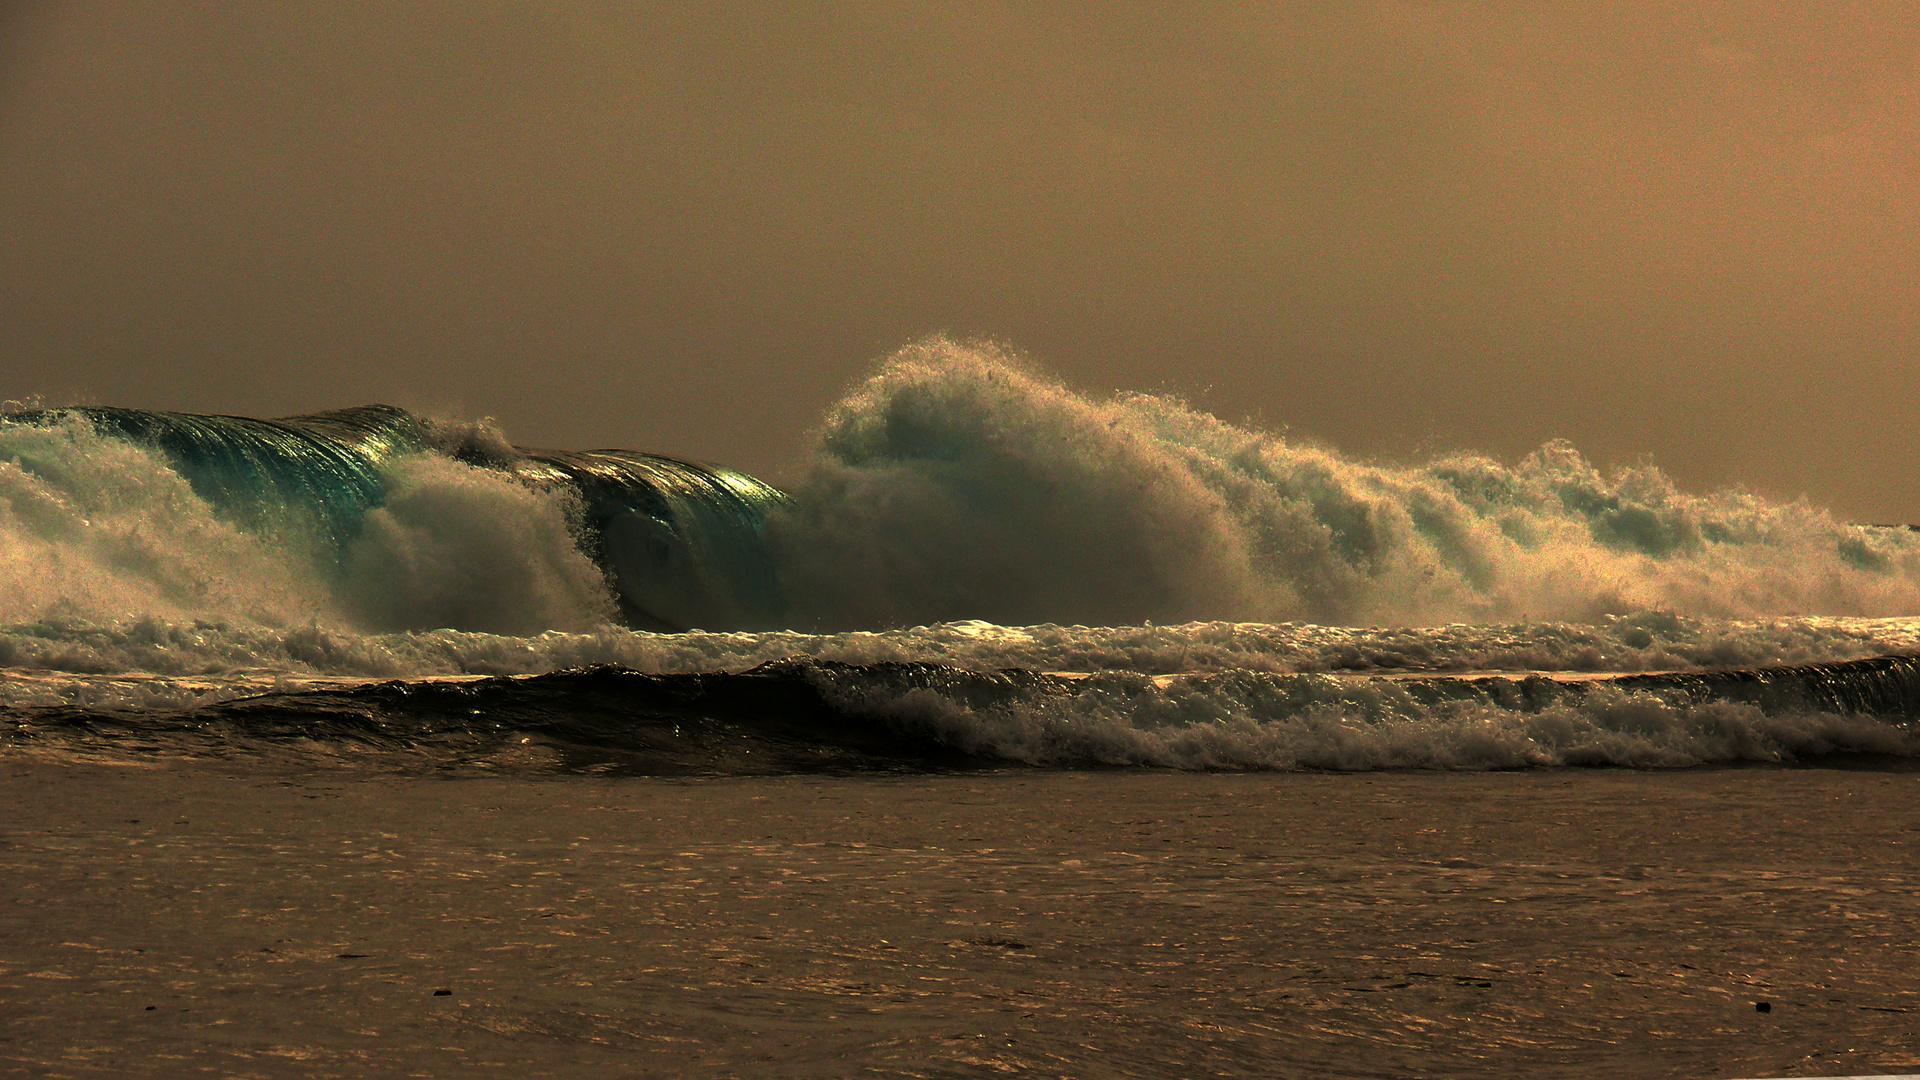 Morning Waves